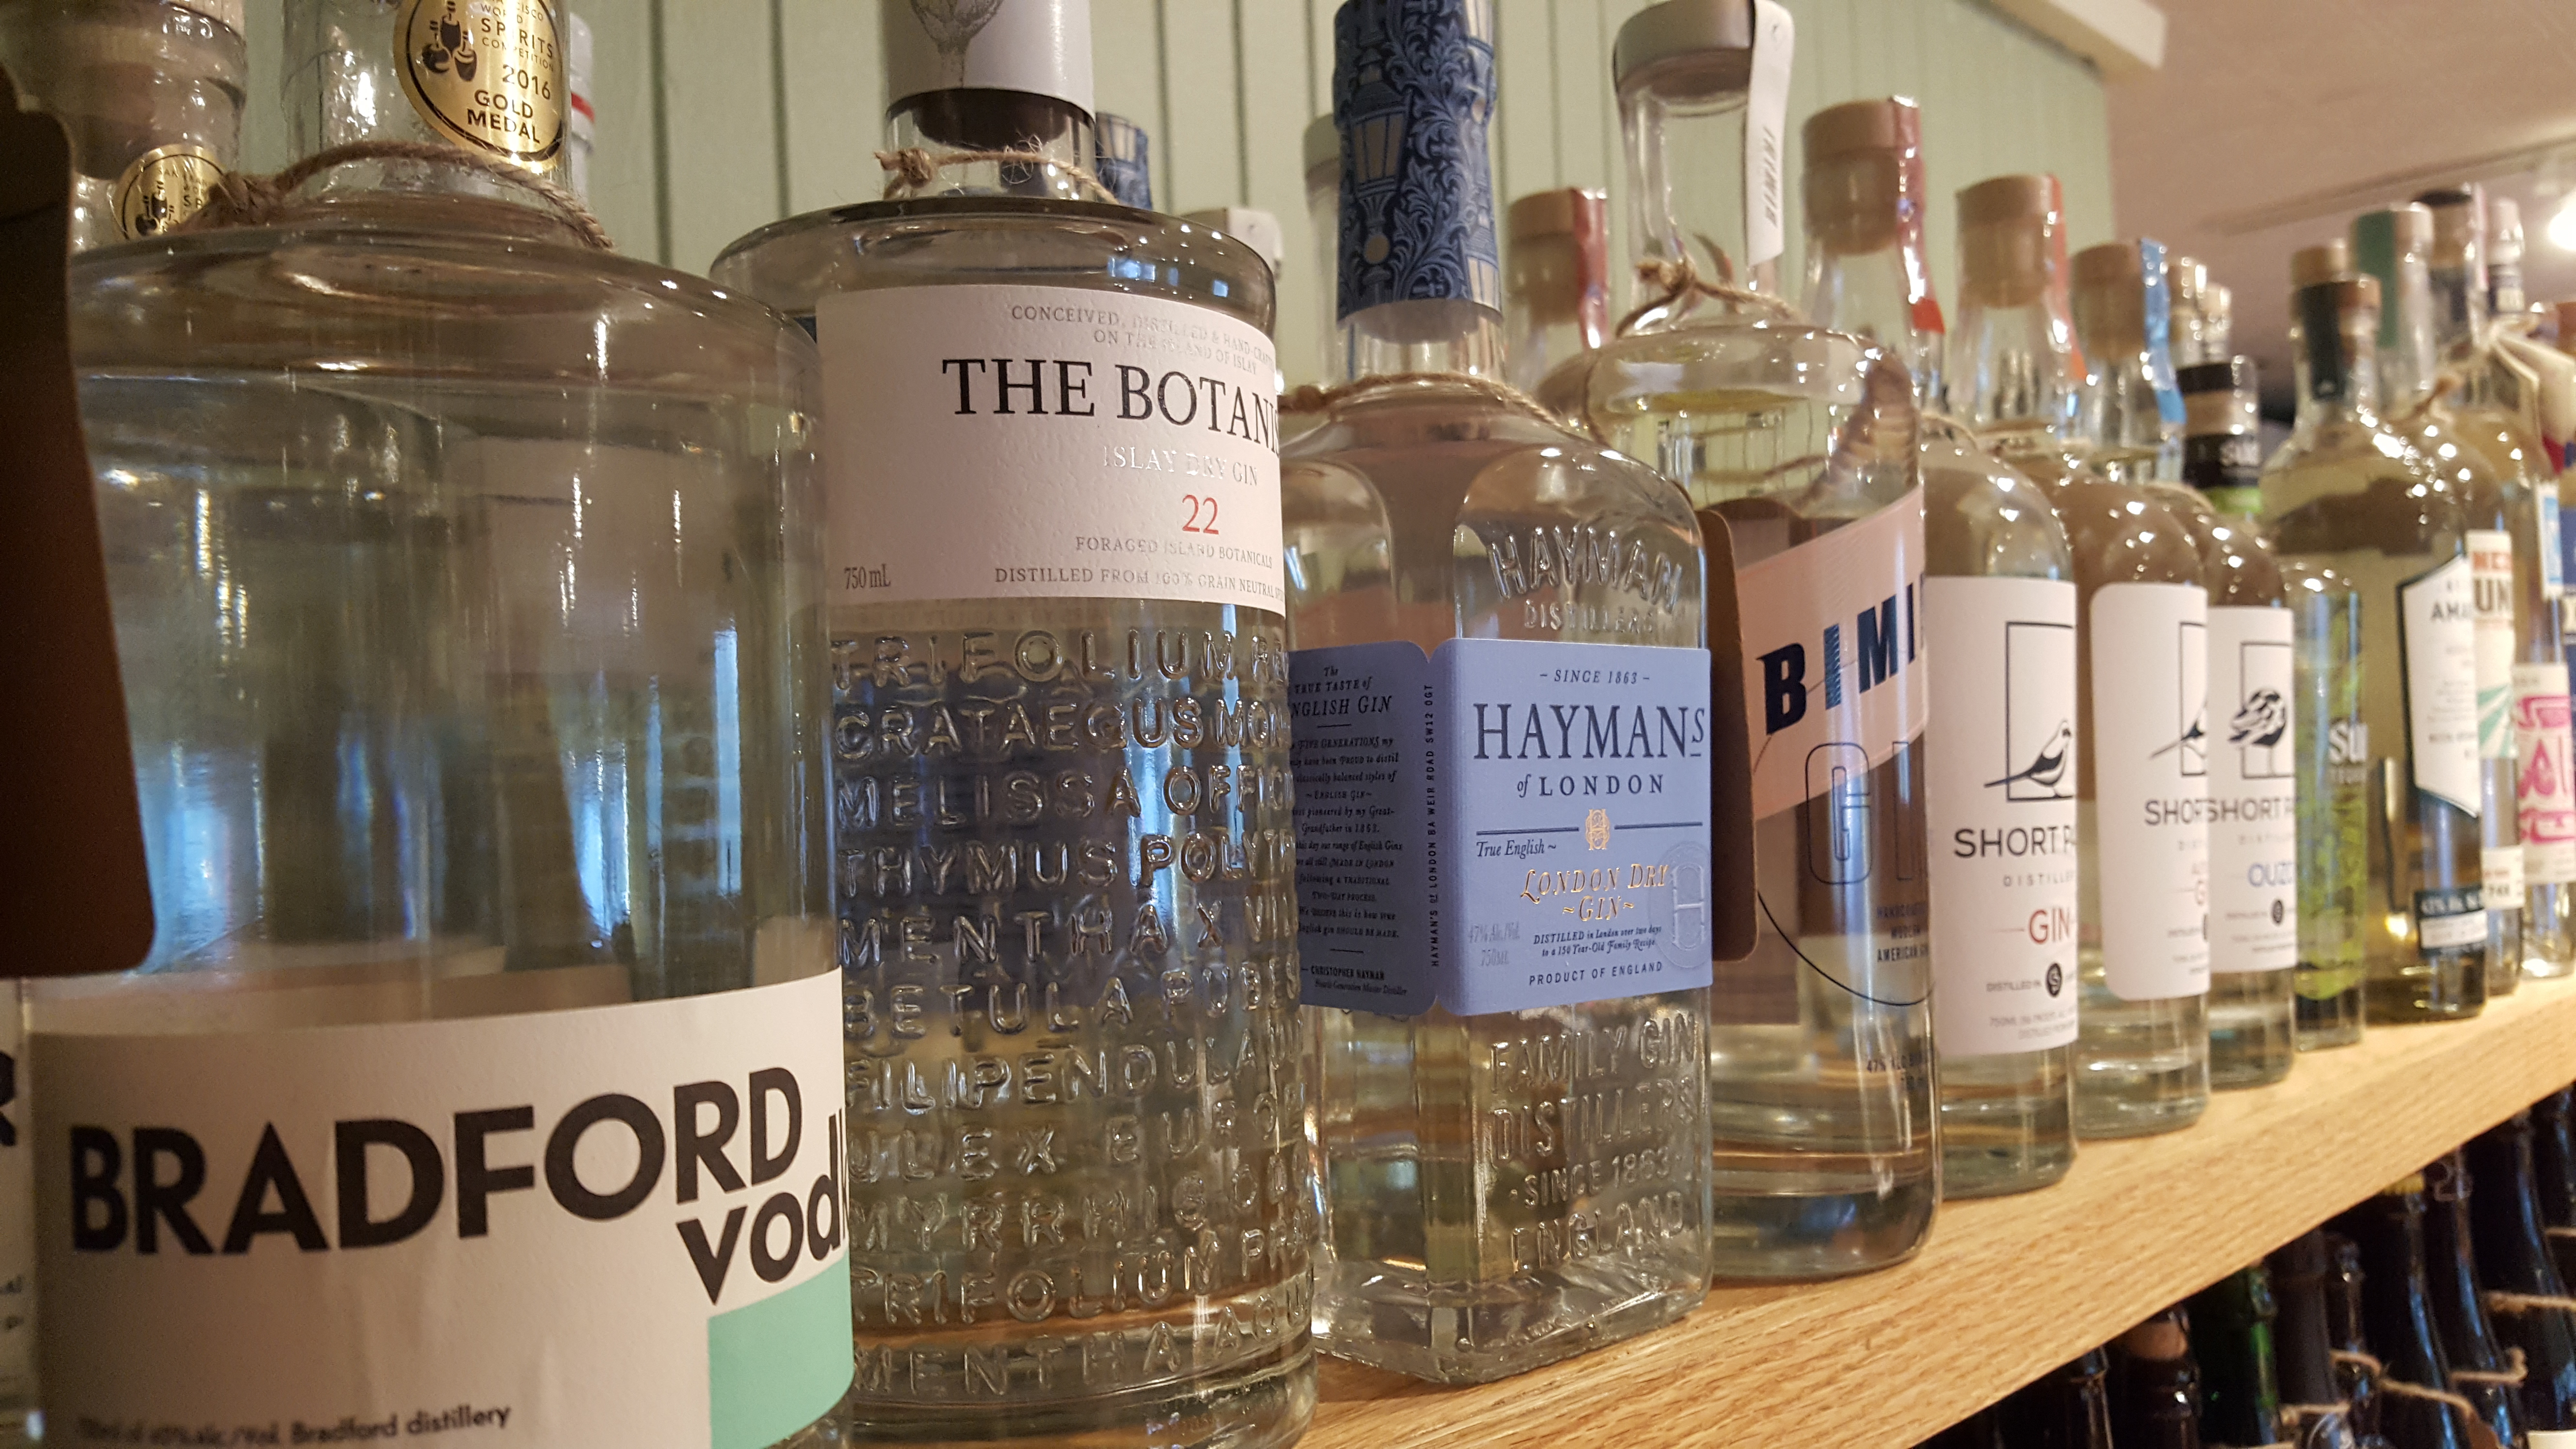 Vodka, Gin, Tequila, Mezcal, Pisco, Cachaca, Ouzo